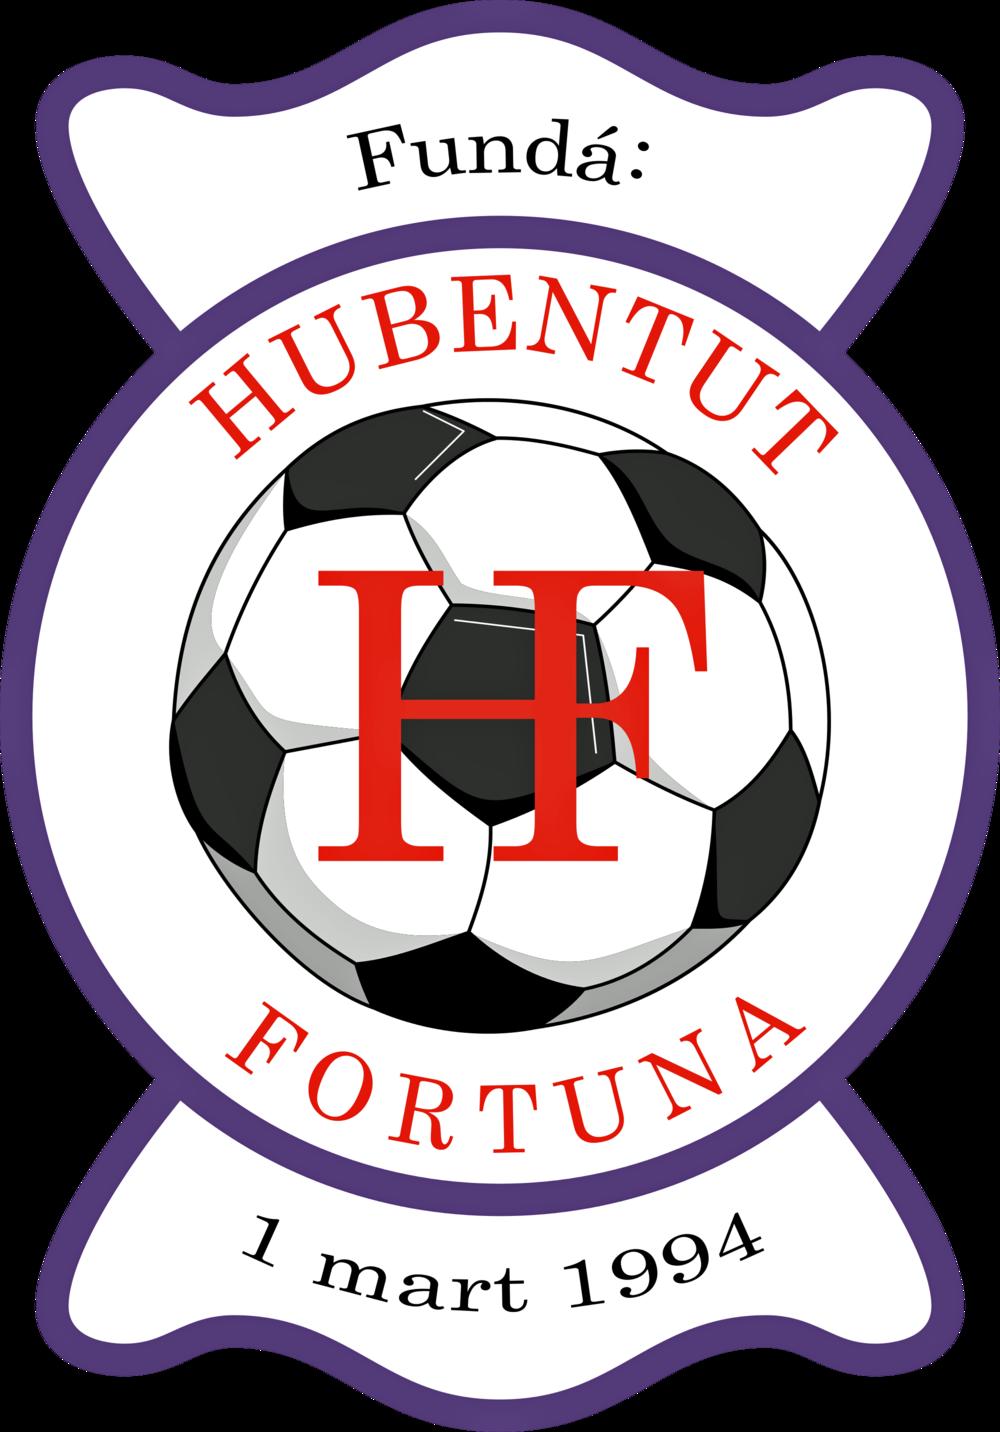 Fortuna, SV Hubentut.png